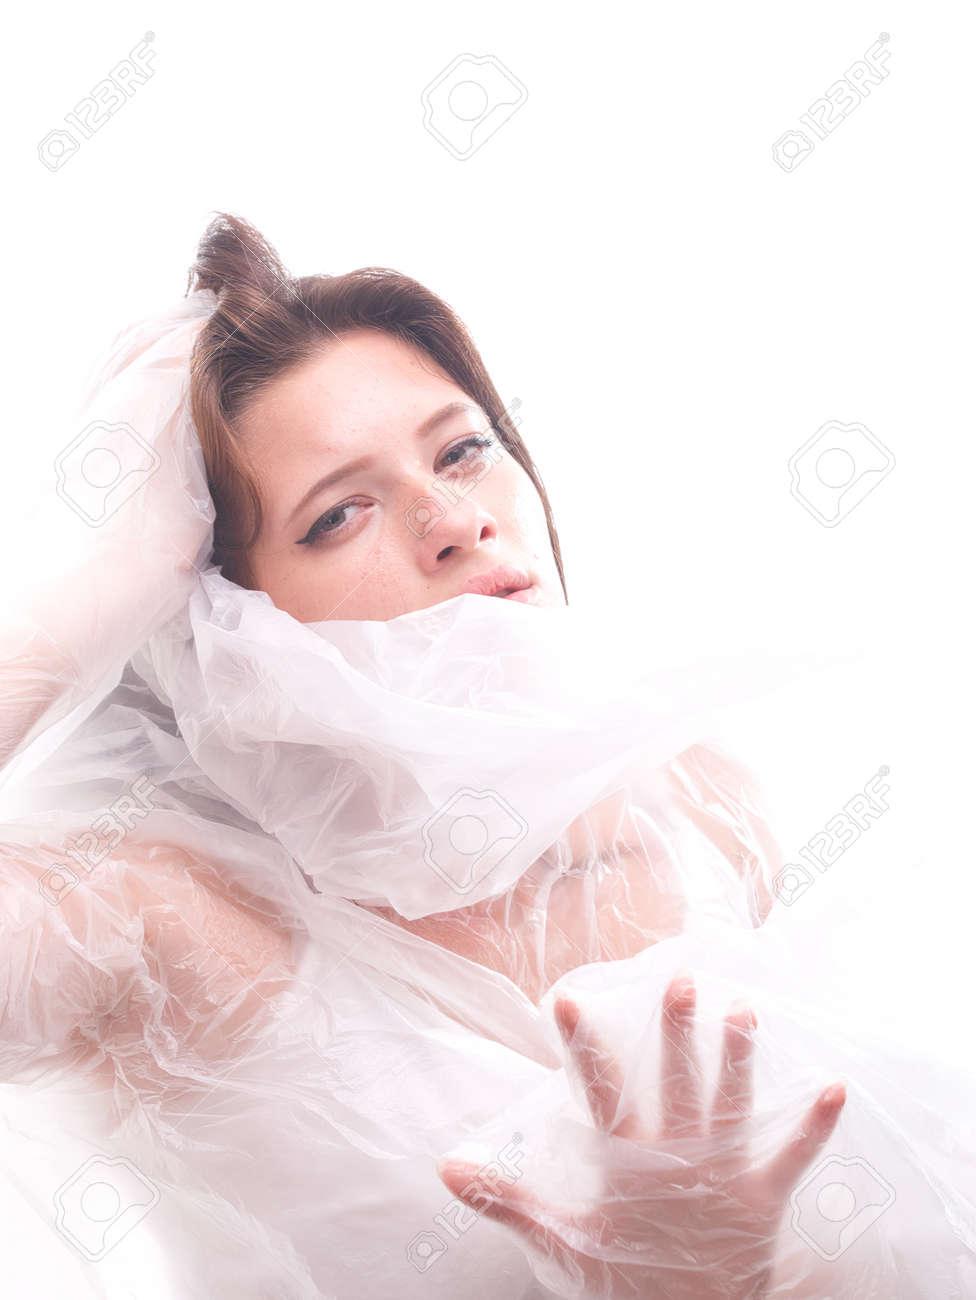 high key. Conceptual portrait with plastic sheets. One young woman strugling with plastic sheets. - 164118923